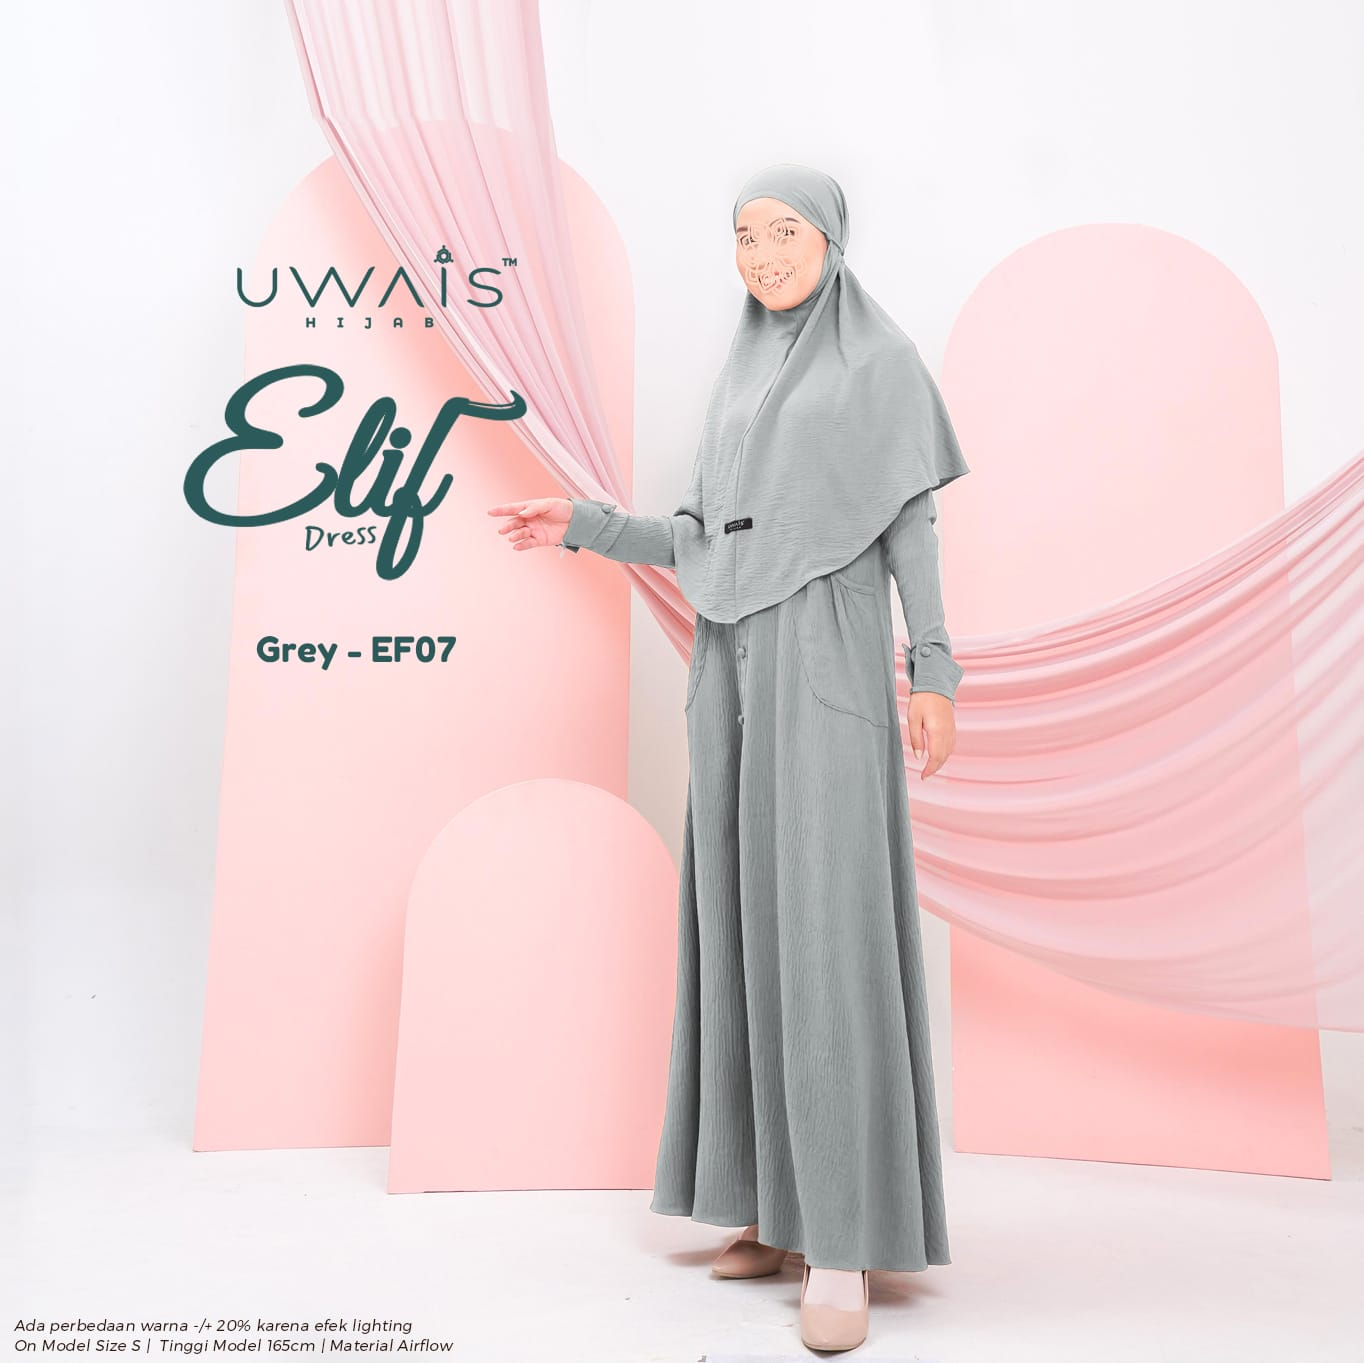 elif_dress_grey